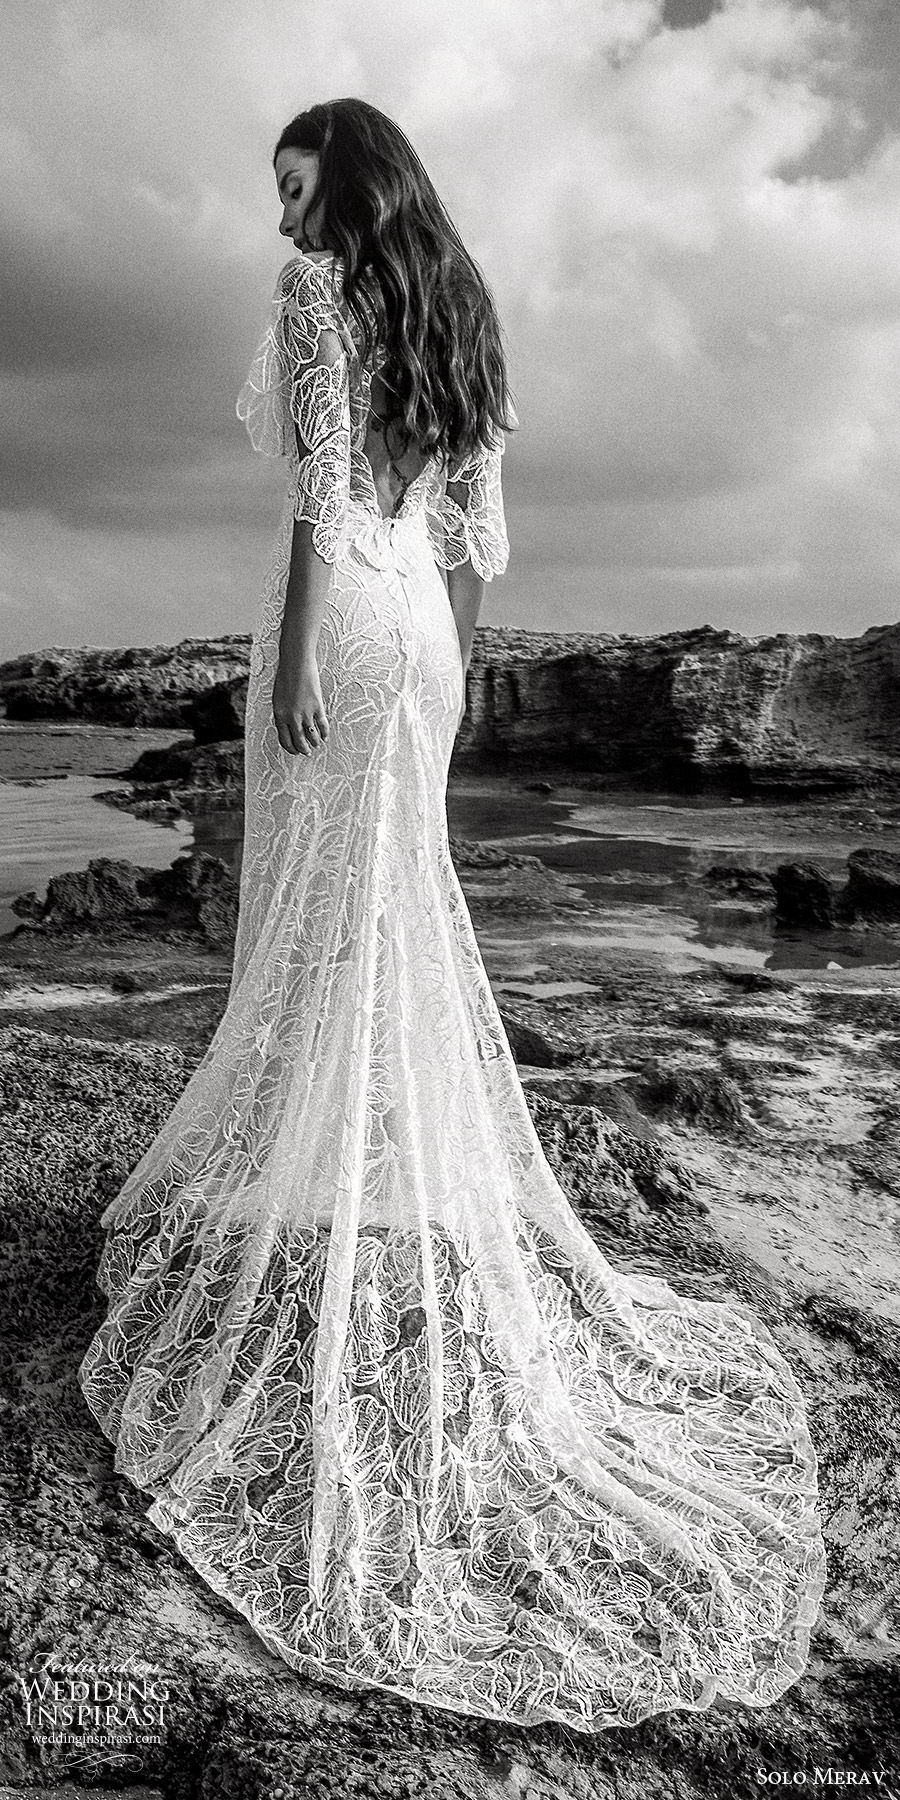 solo merav 2019 bridal flutter sleeves plunging v neckline sheath embellished lace wedding dress (2) bv low back sweep train bohemian romantic